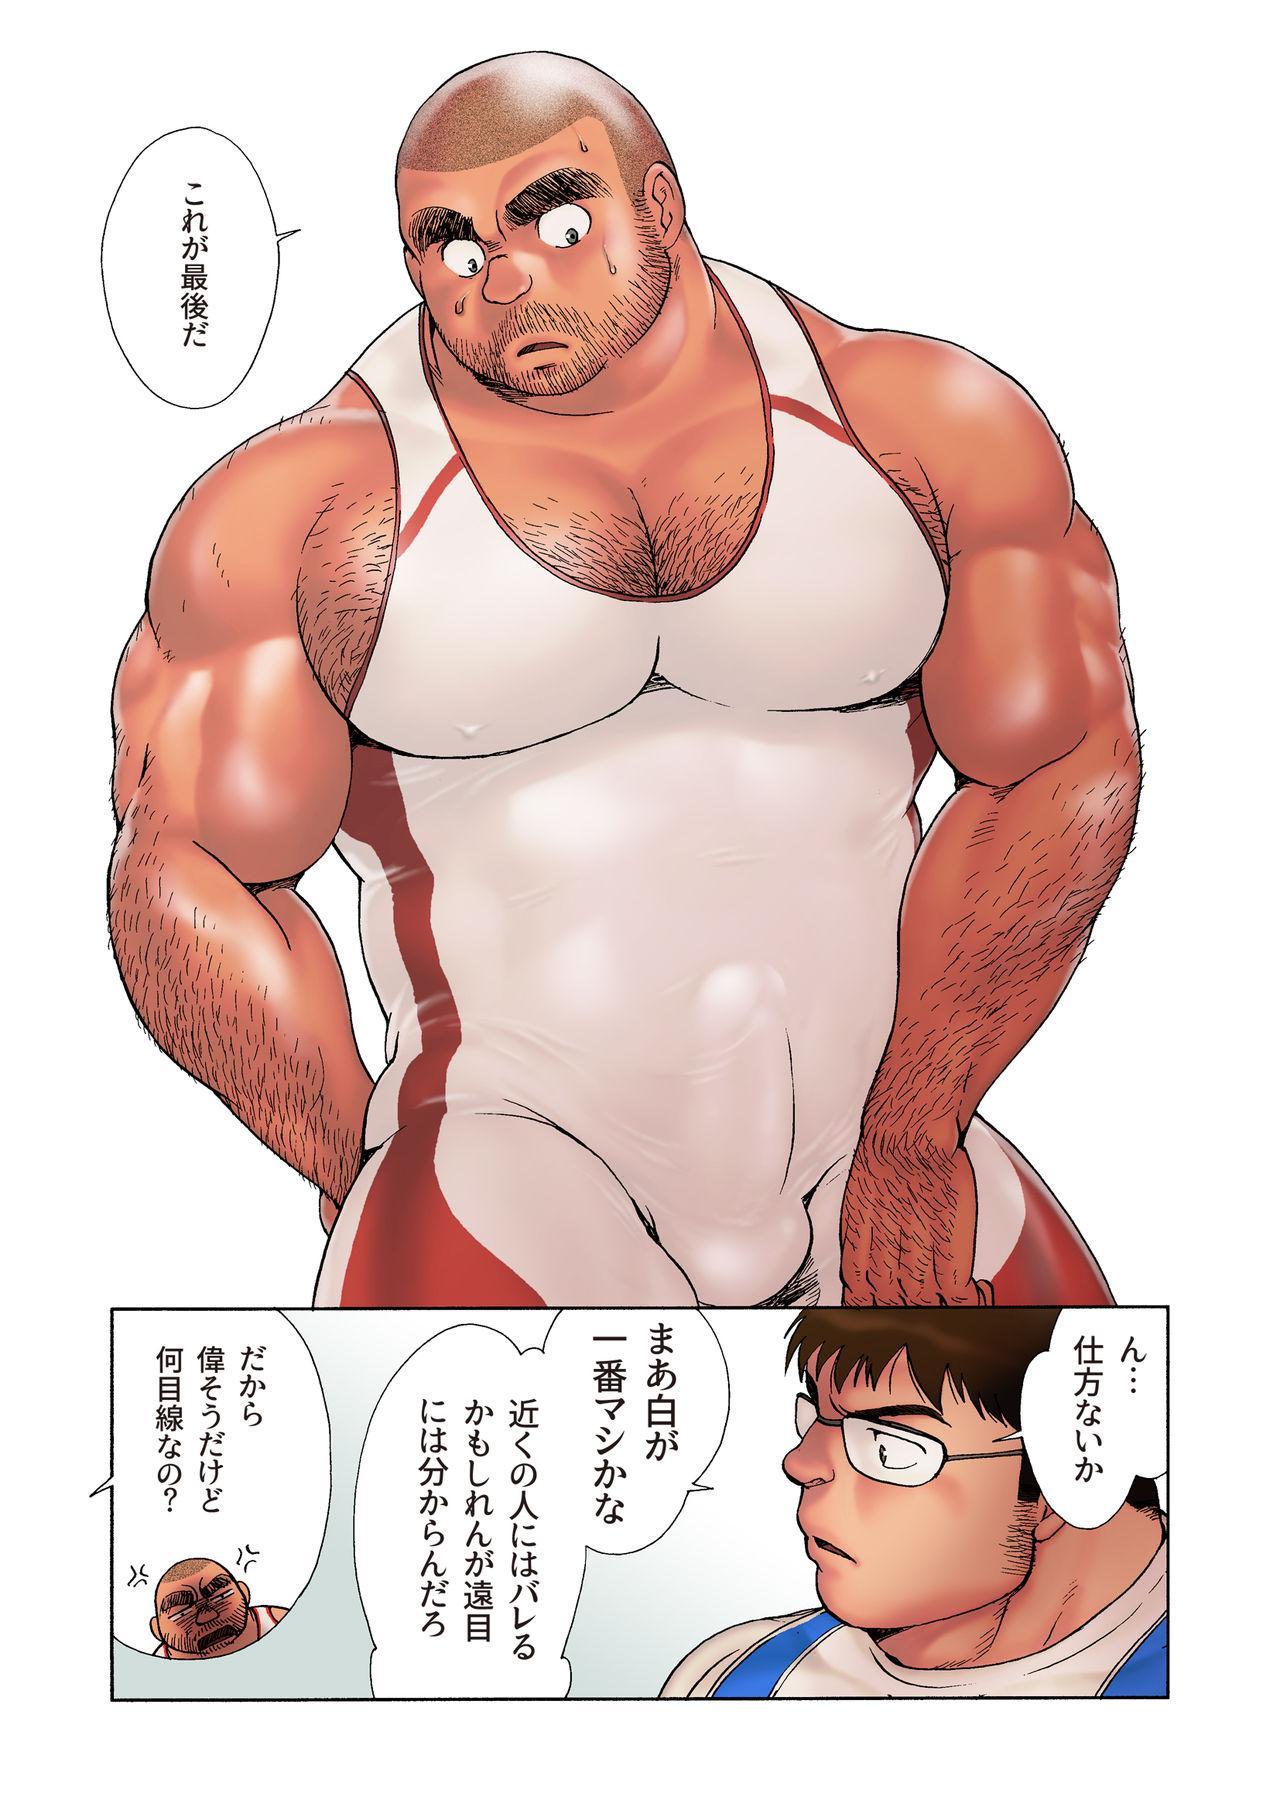 Danshi Koukousei Weightlifter Shiai-chuu, Osae kirenai Wakai Takeri 53